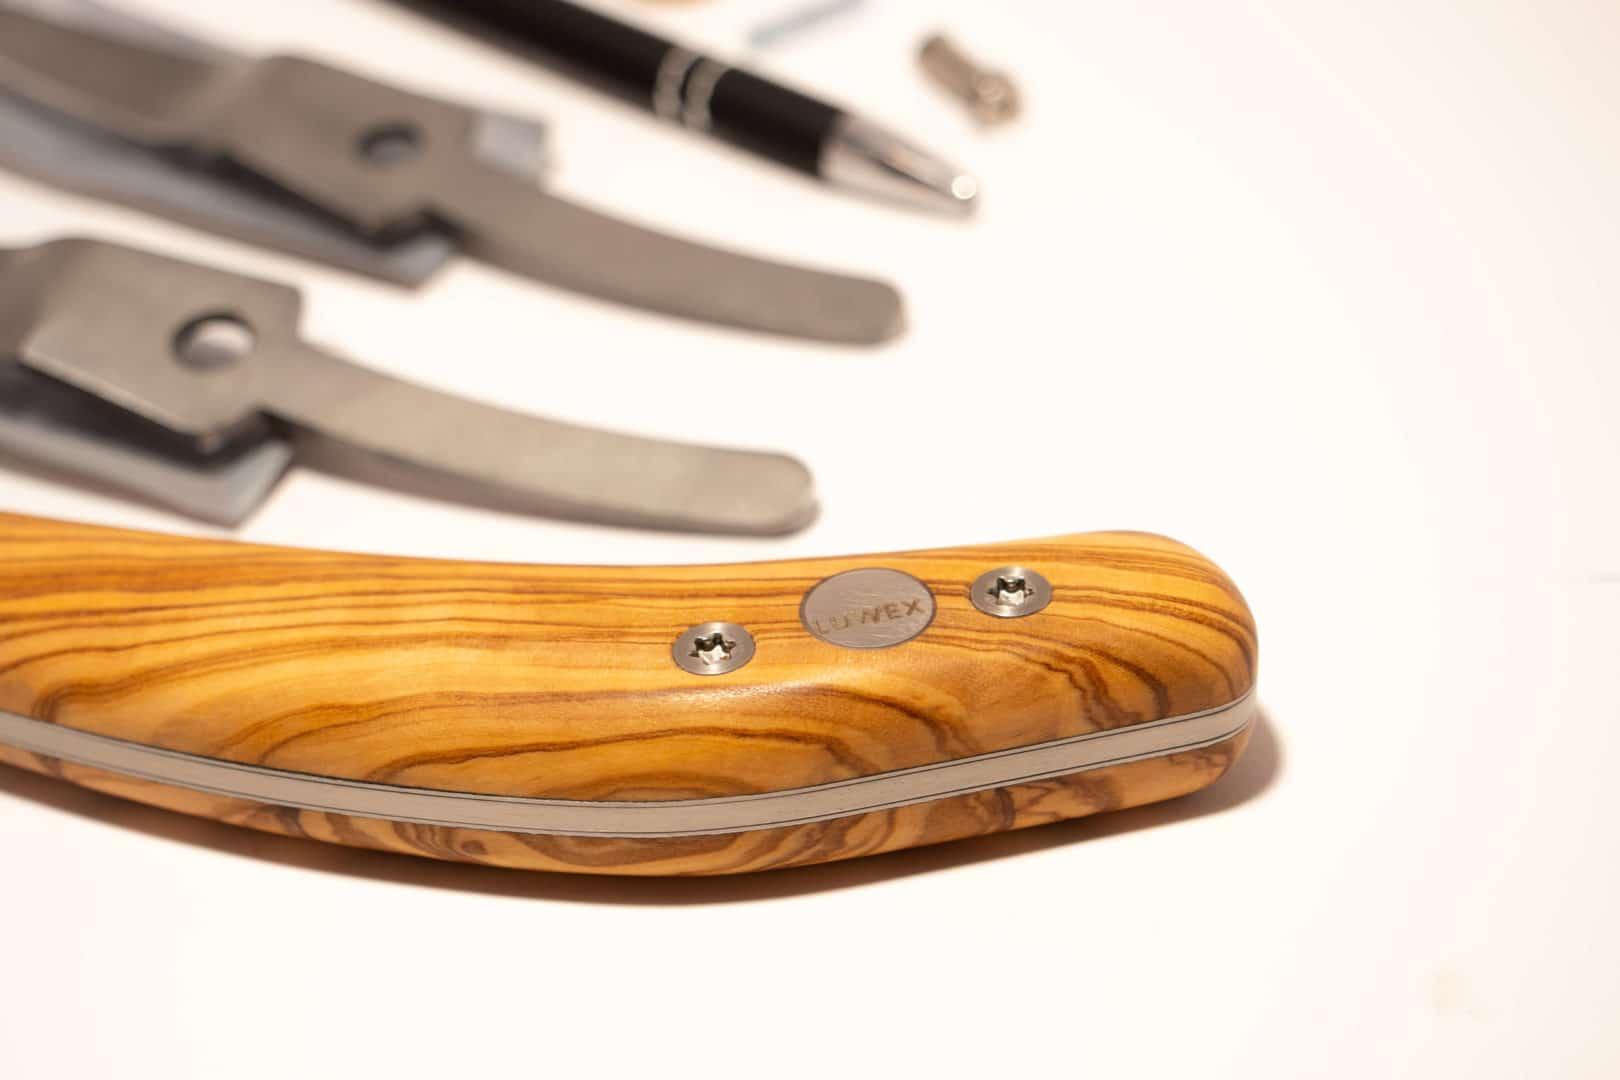 Luwex Drop Blade Set - Handle Close Up